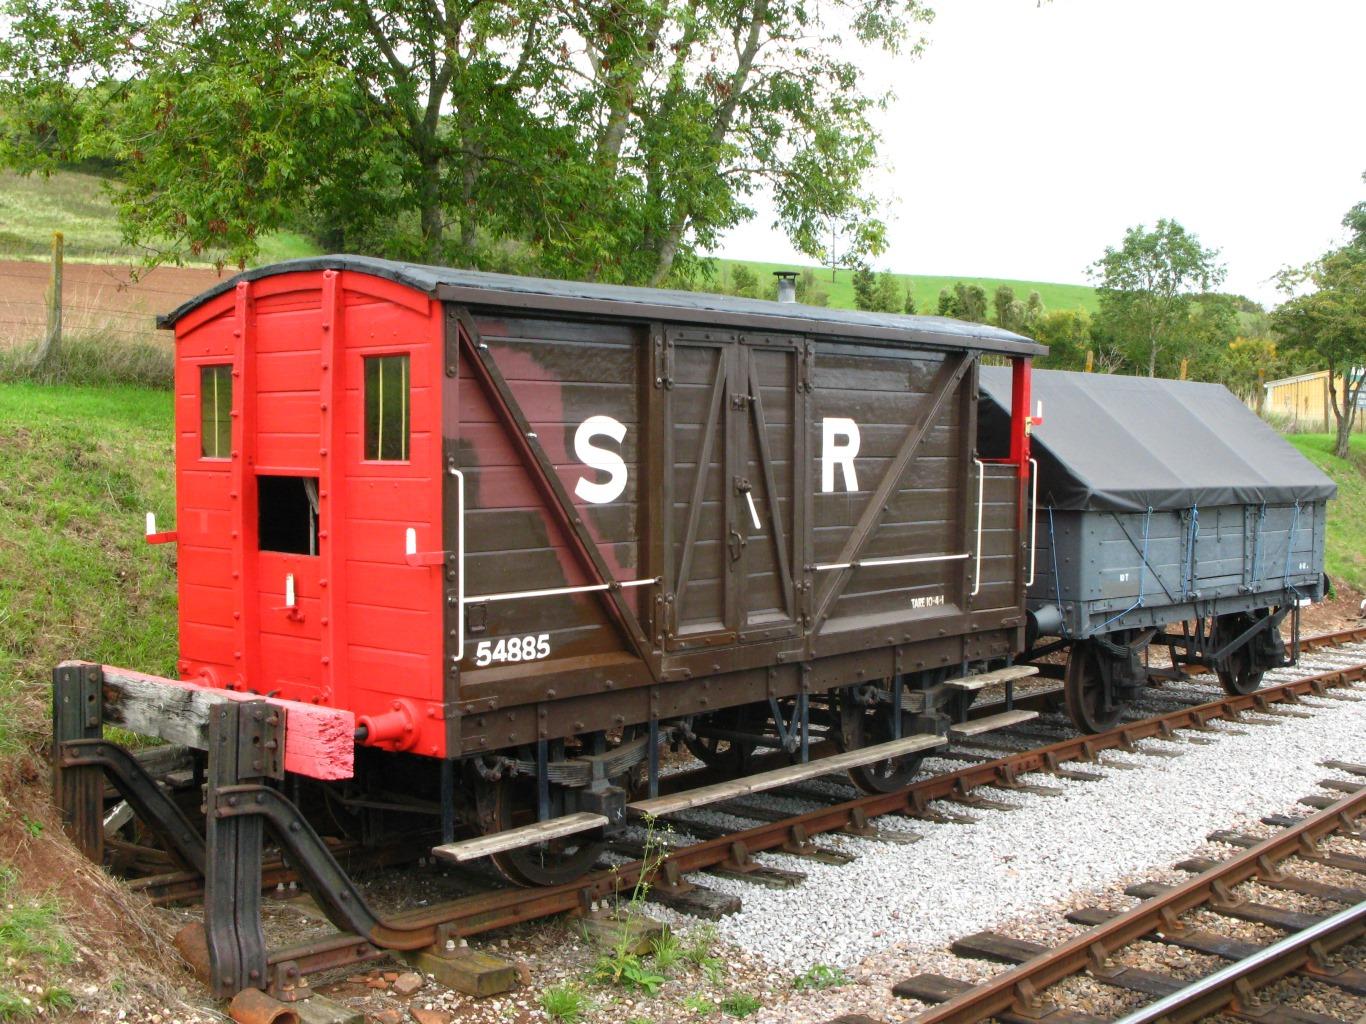 SR_%28ex-LSWR%29_brake_van_54885_and_LNE